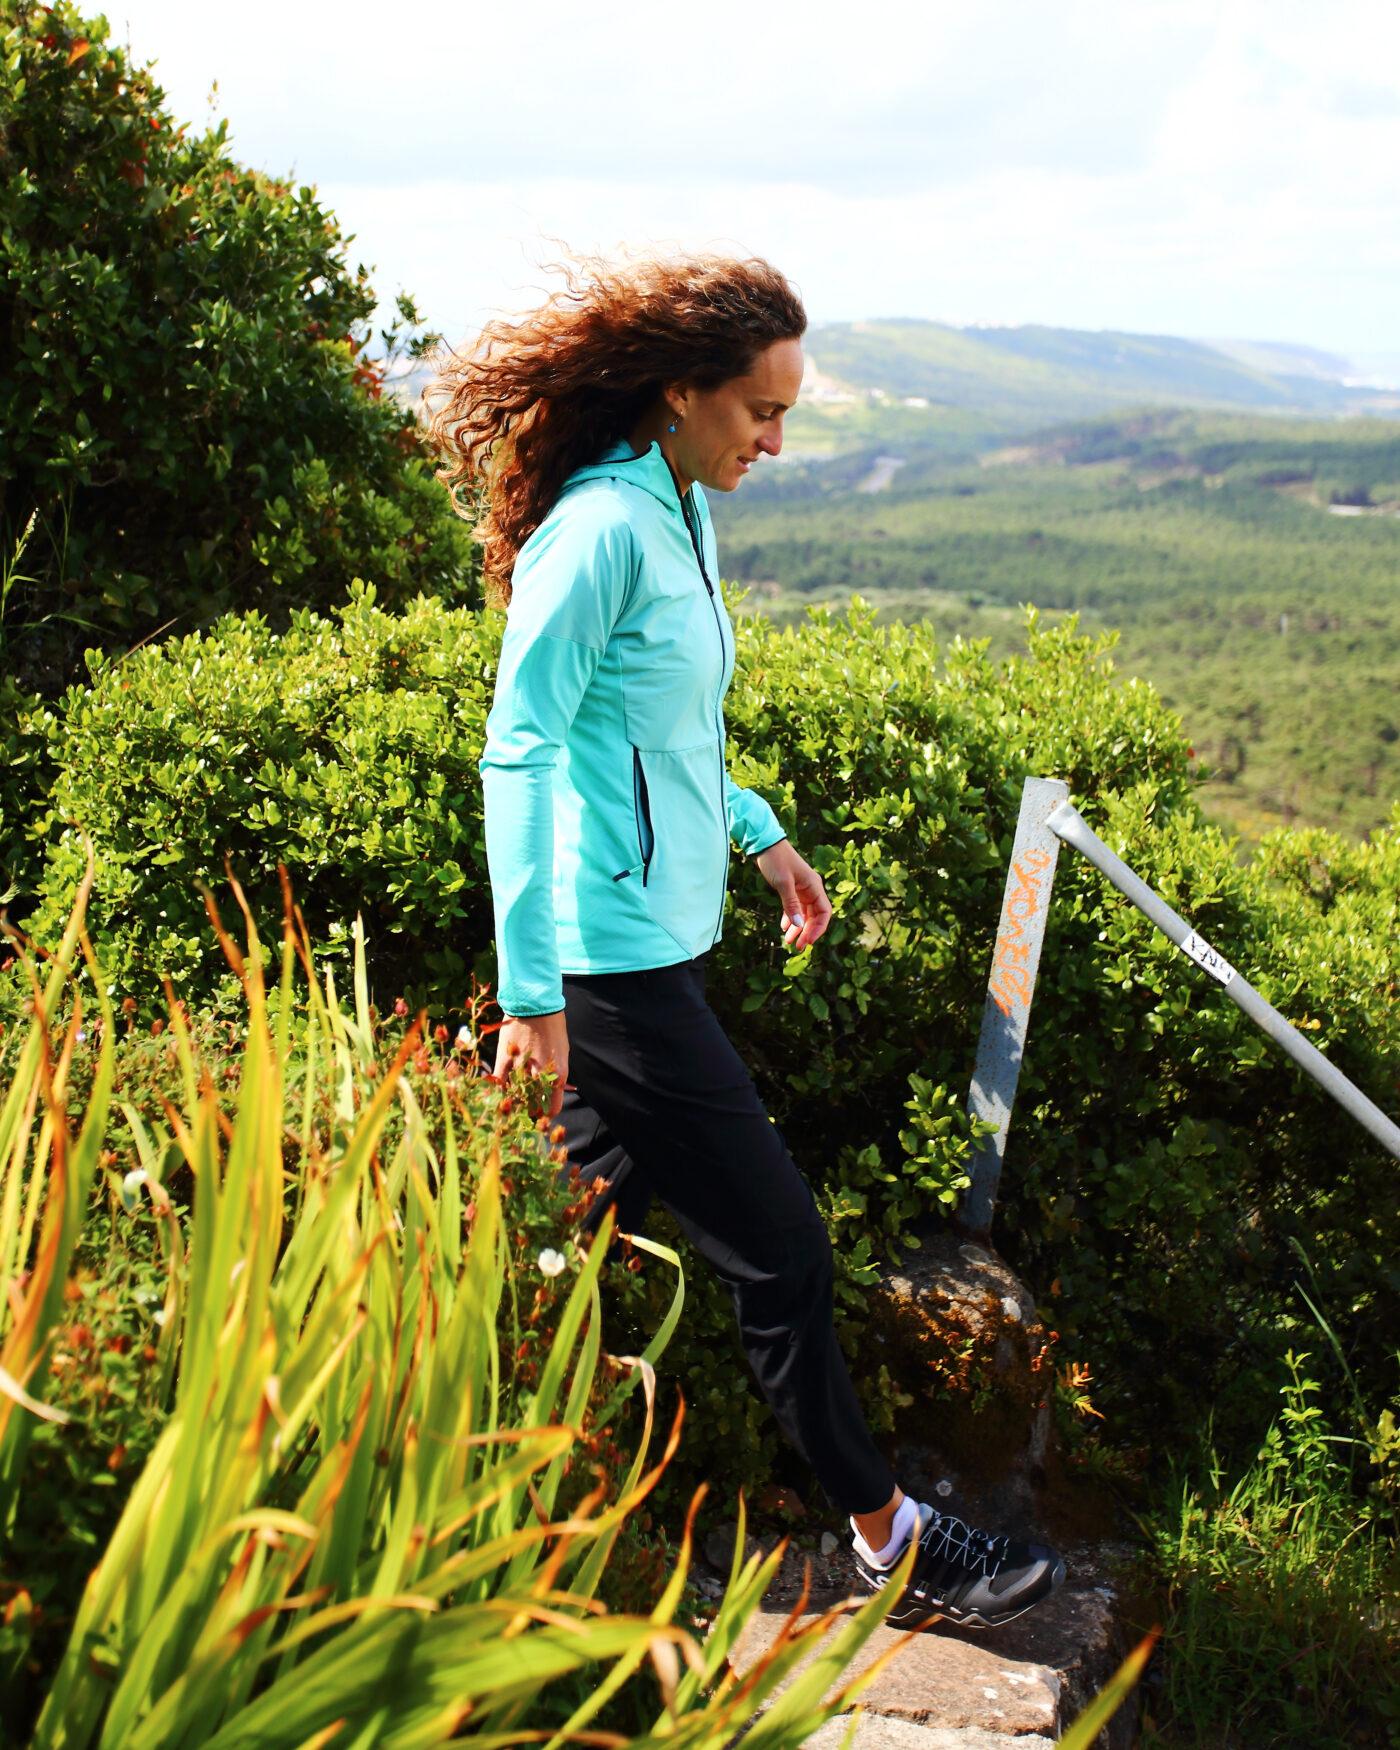 adidas rental pilot running trail outdoor 4